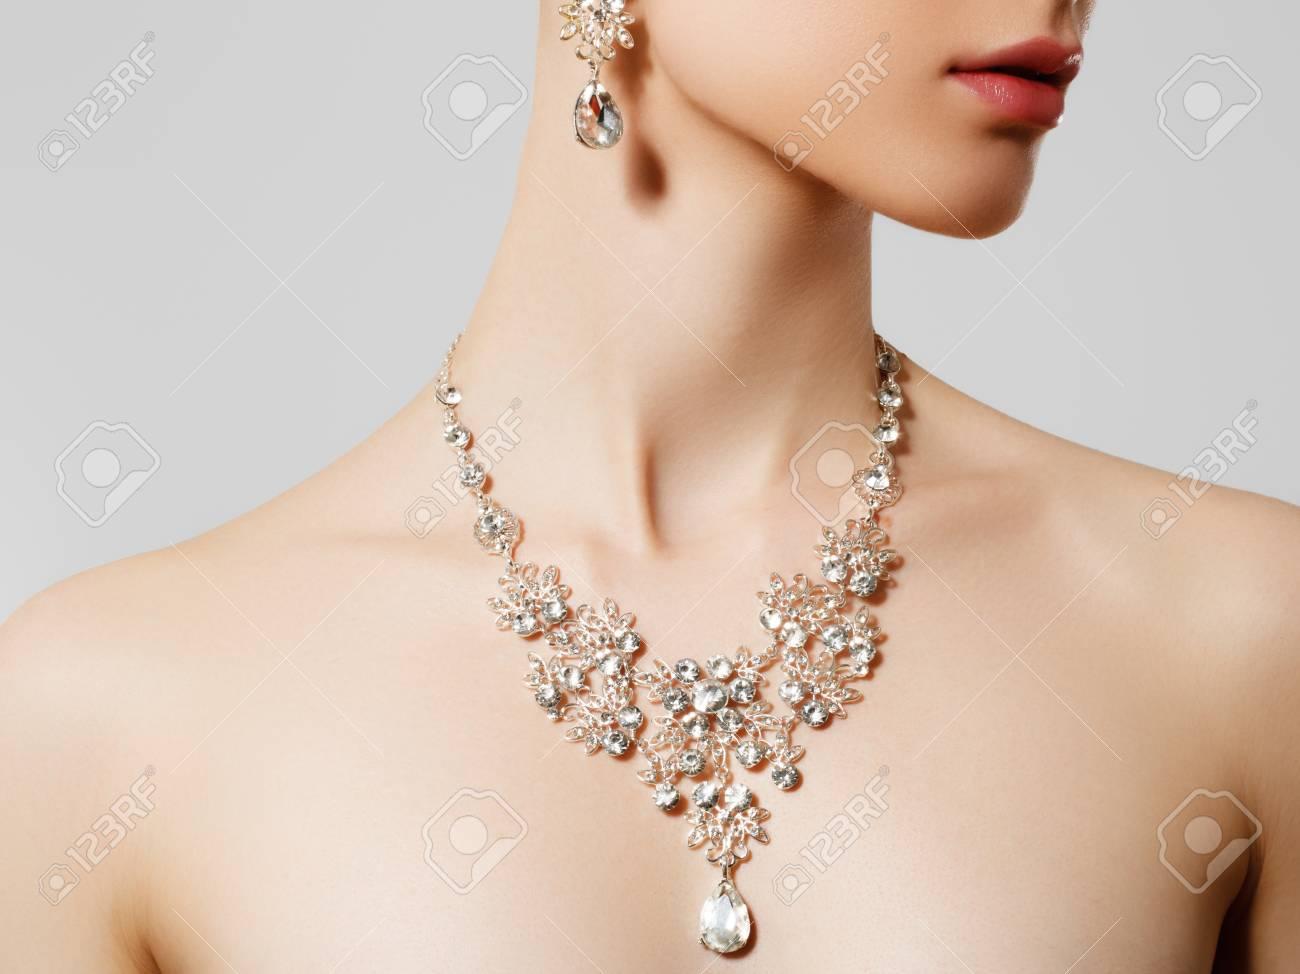 Elegant Woman With Jewelry Beautiful Woman With Diamond Necklace